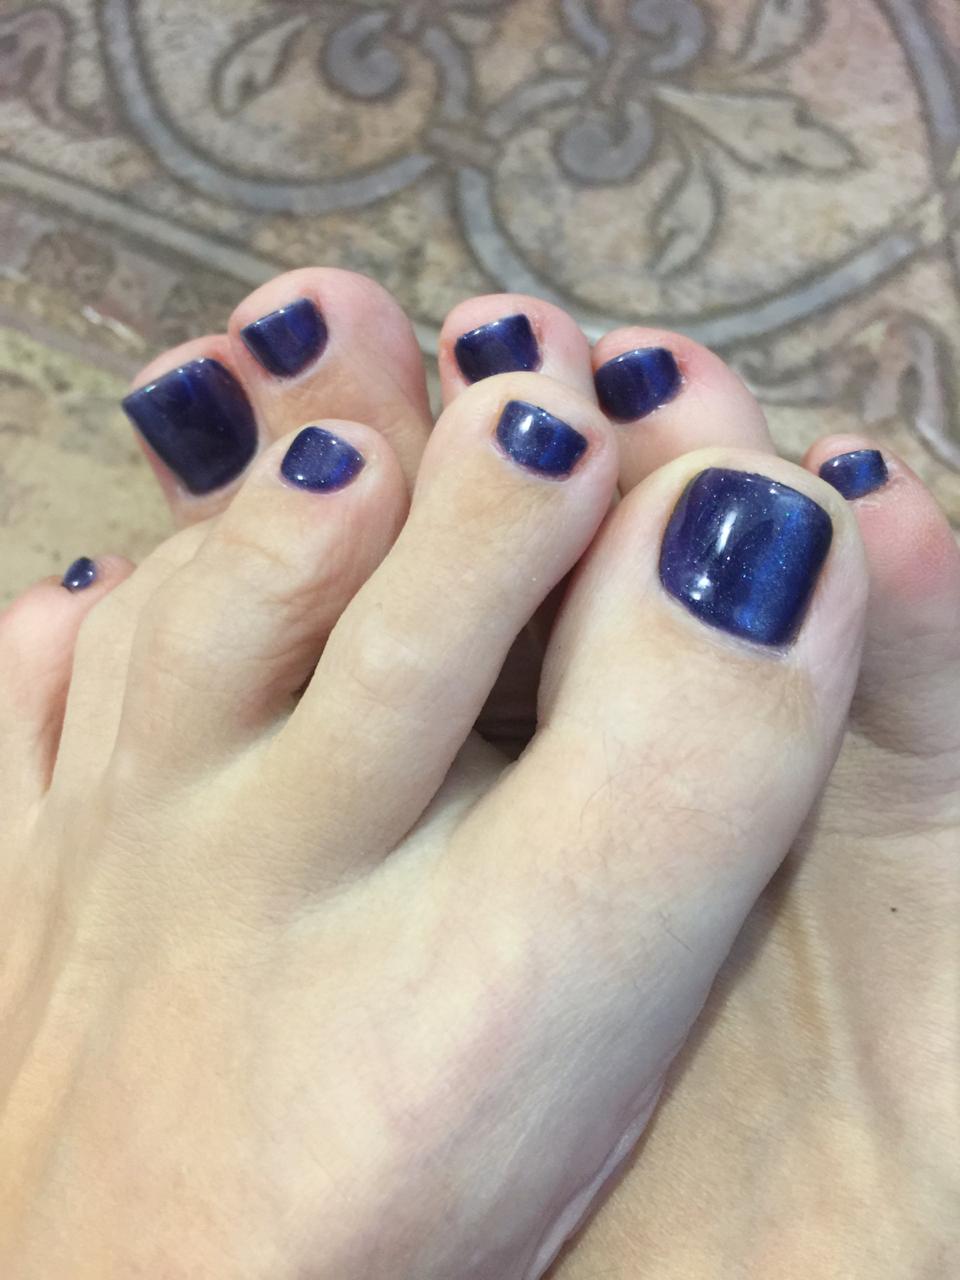 Педикюр с блестками в темно-синем цвете.